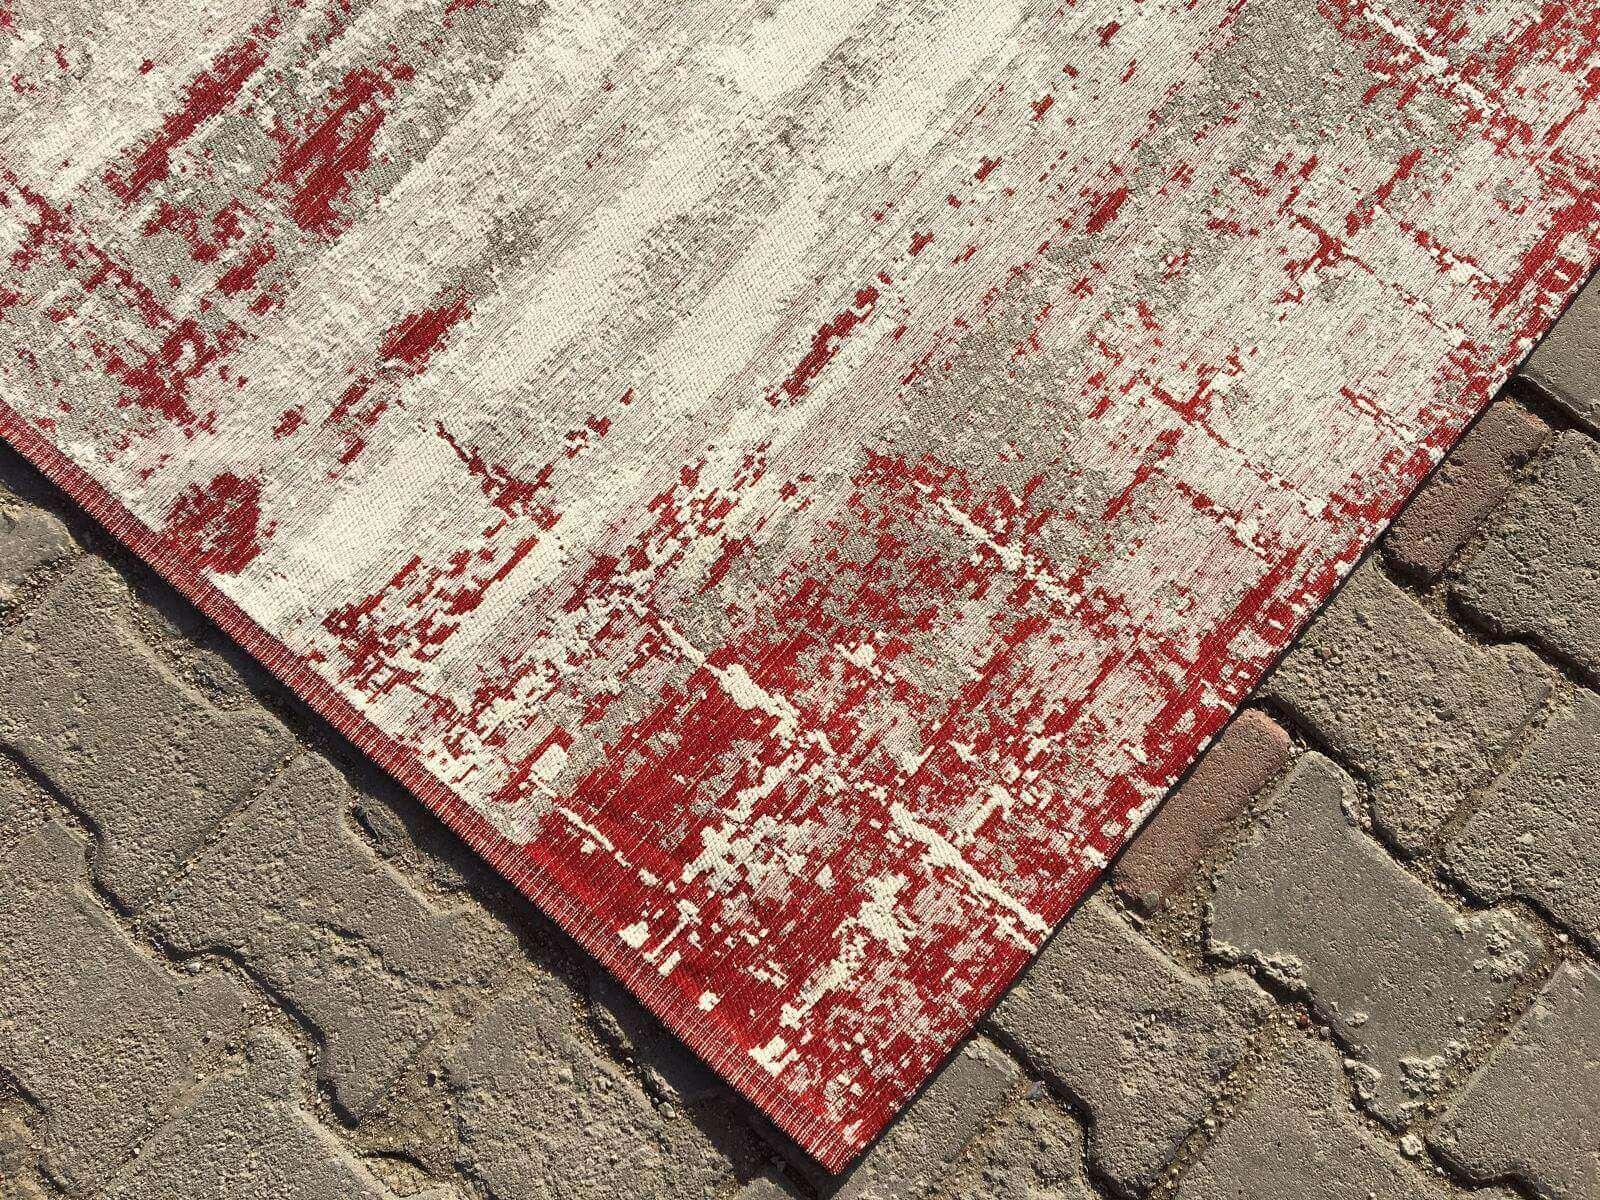 COTTON LÜX KİLİM KIRMIZI 120X180 Cotton Lux Kilim Dekoratif Kilim